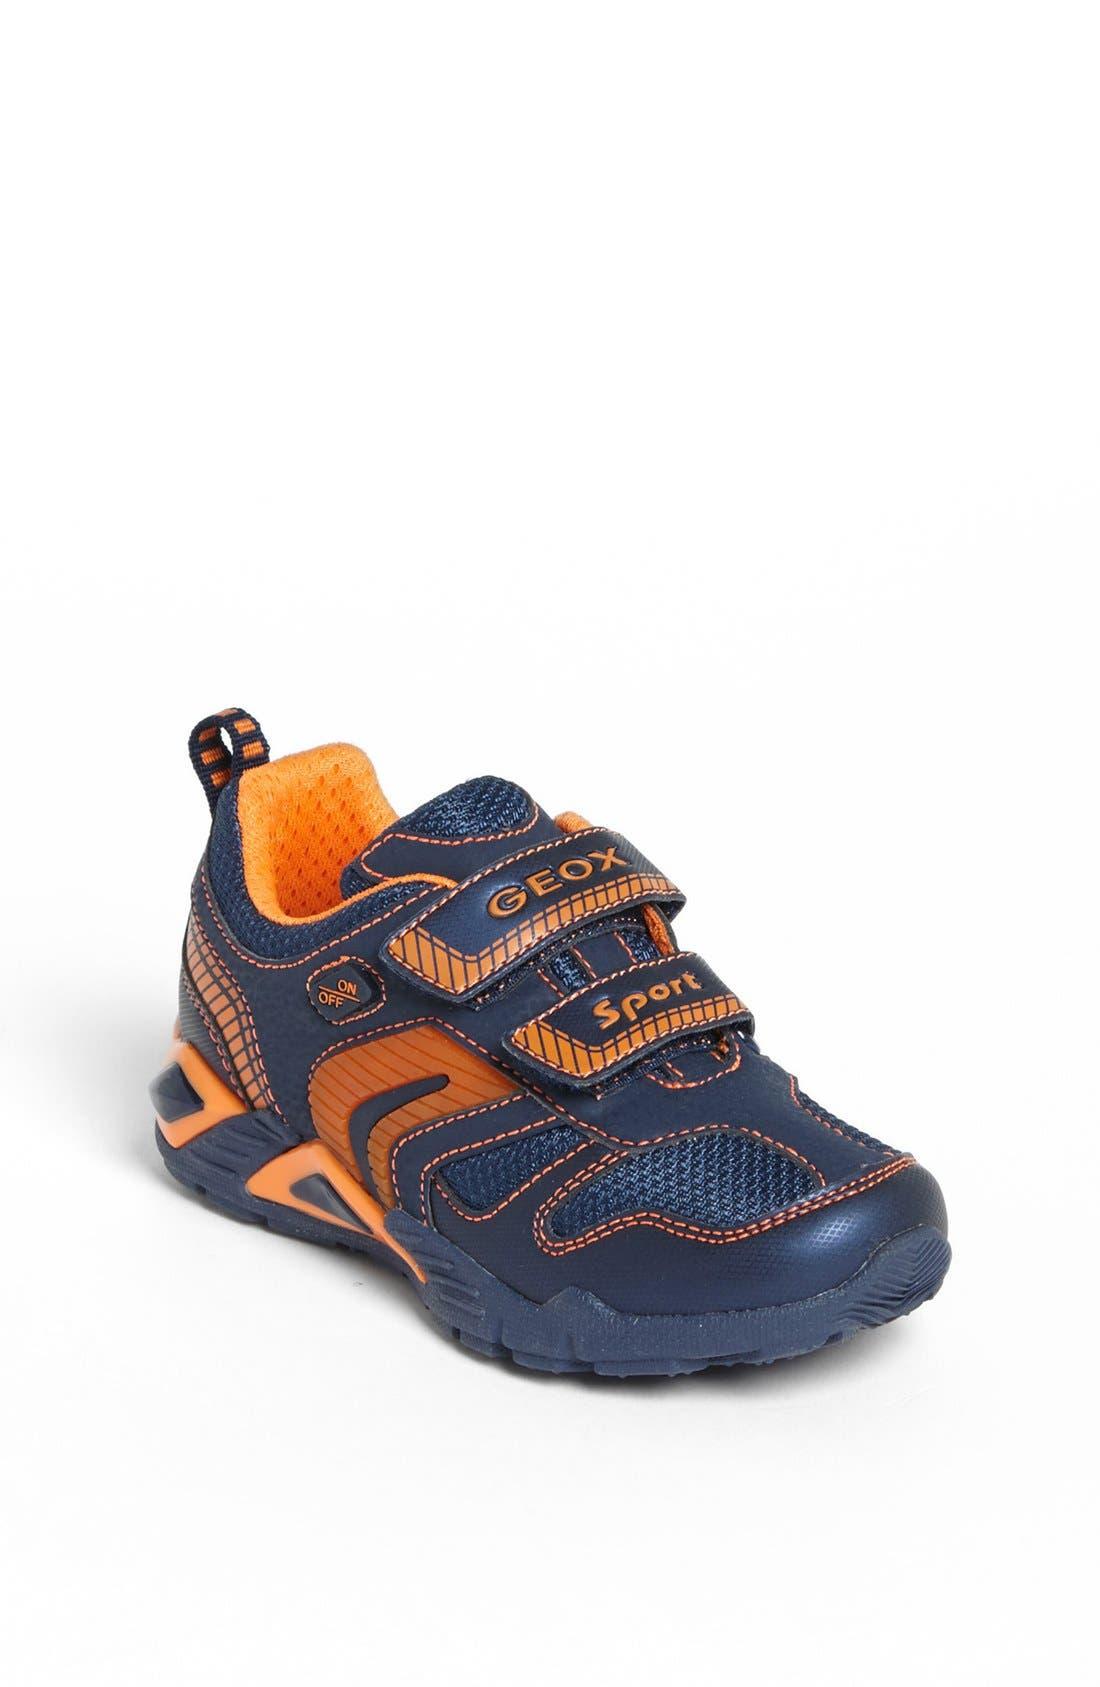 Main Image - Geox 'Supreme' Light-Up Sneaker (Toddler, Little Kid & Big Kid)